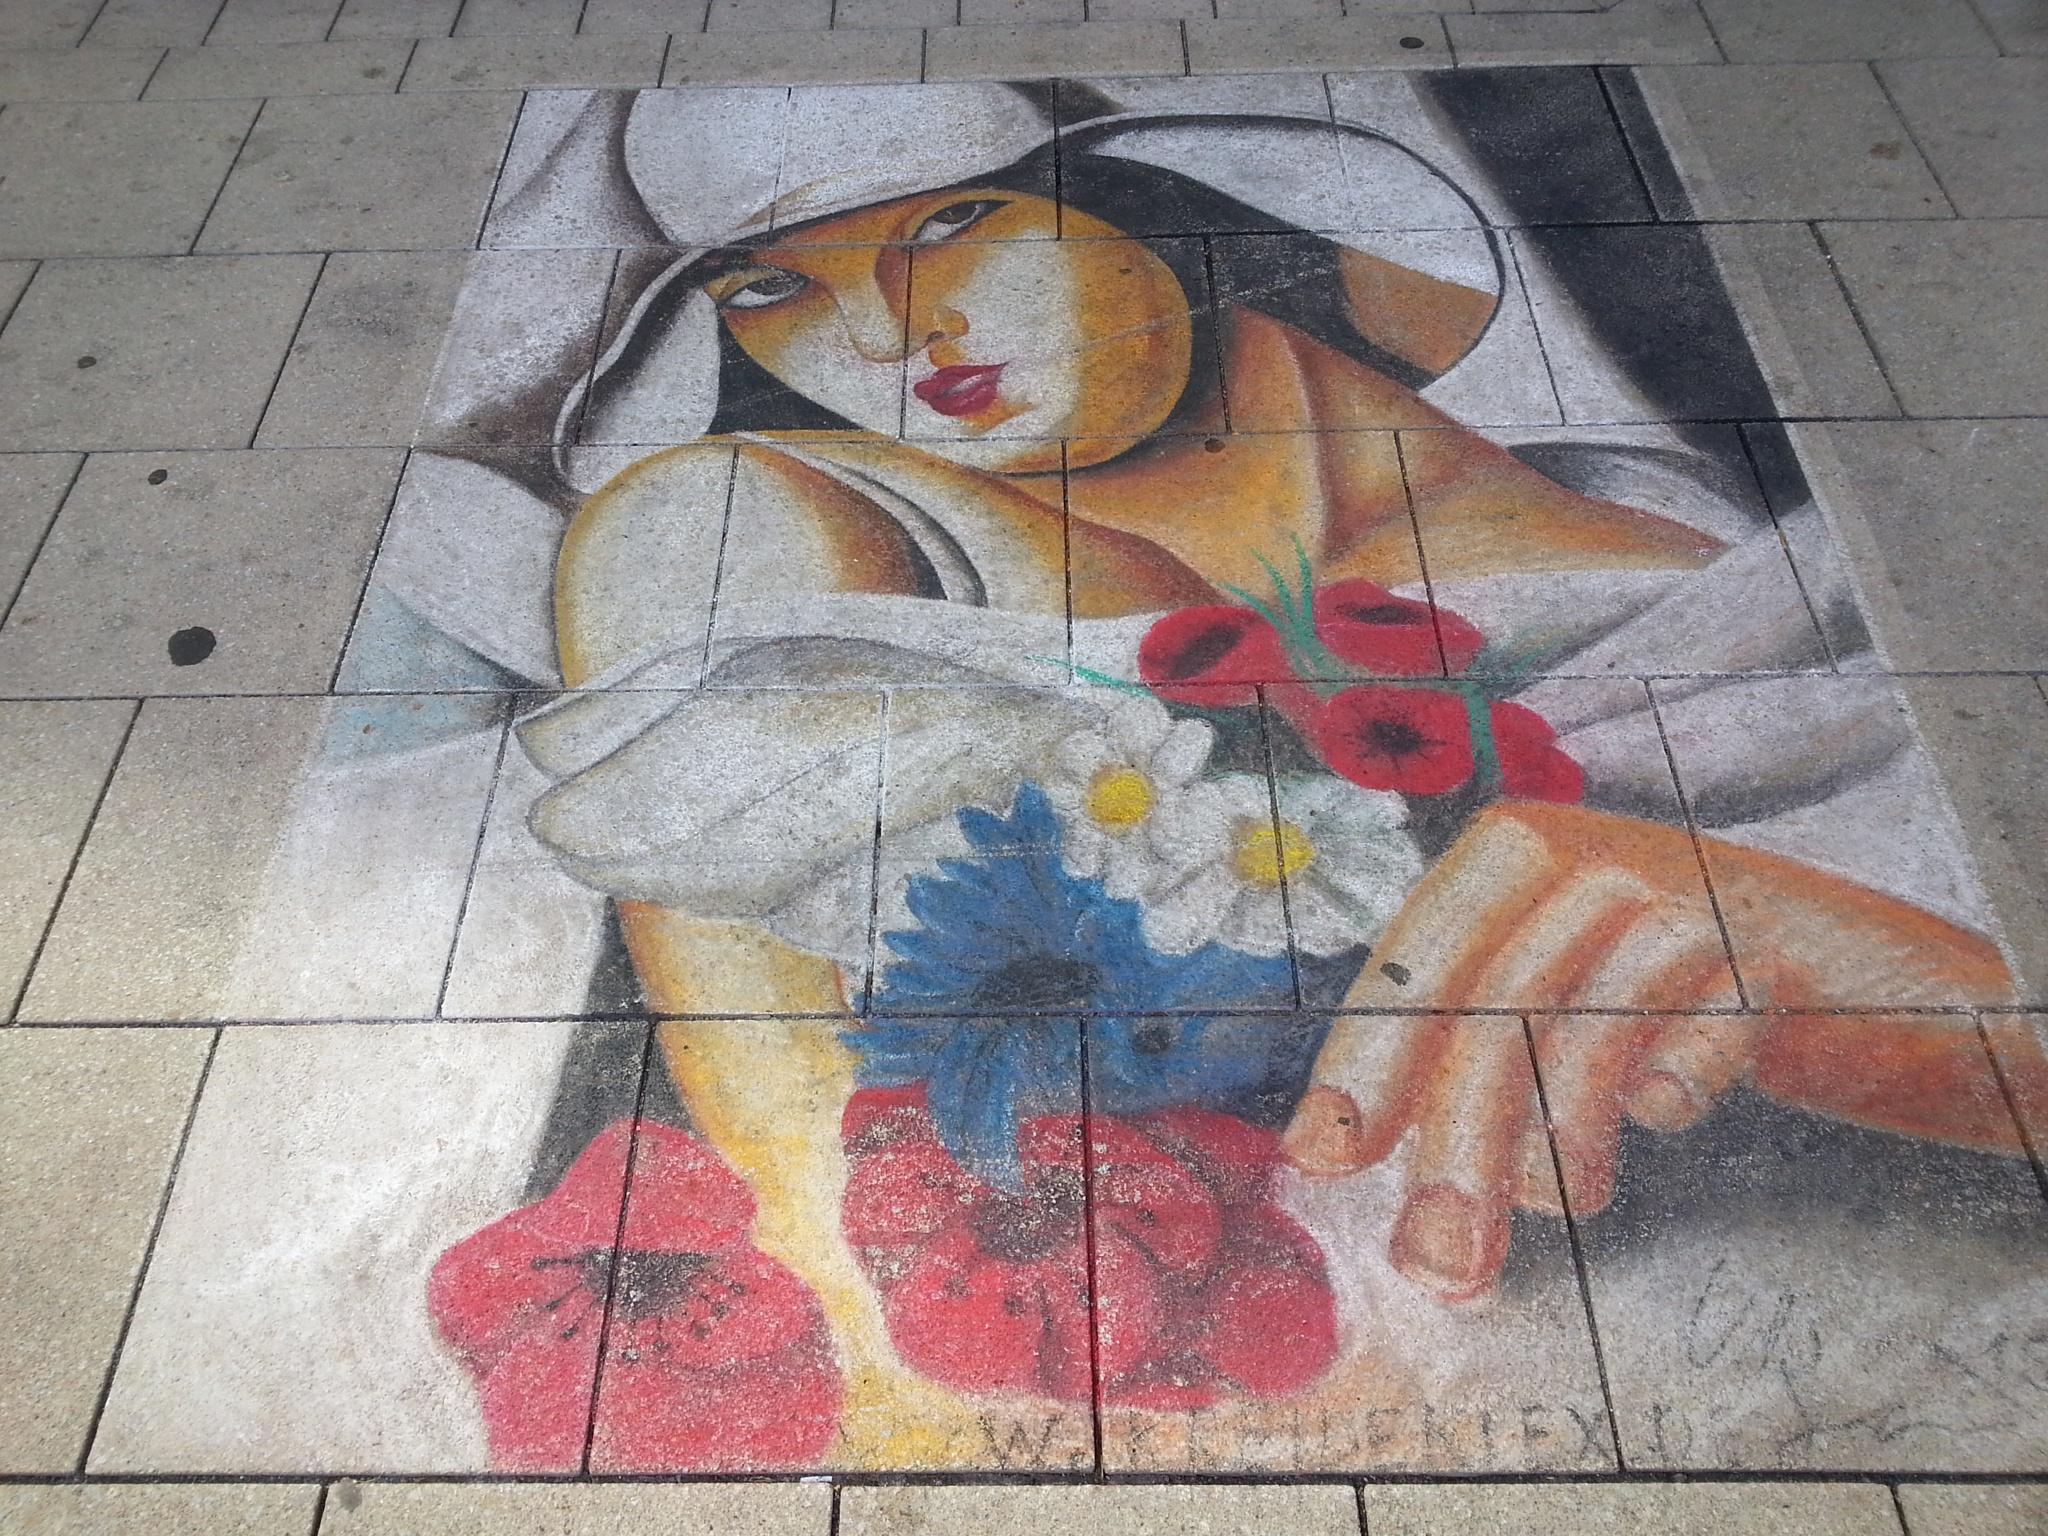 Street-Art in Lennestadt, Germany by konigfeiko